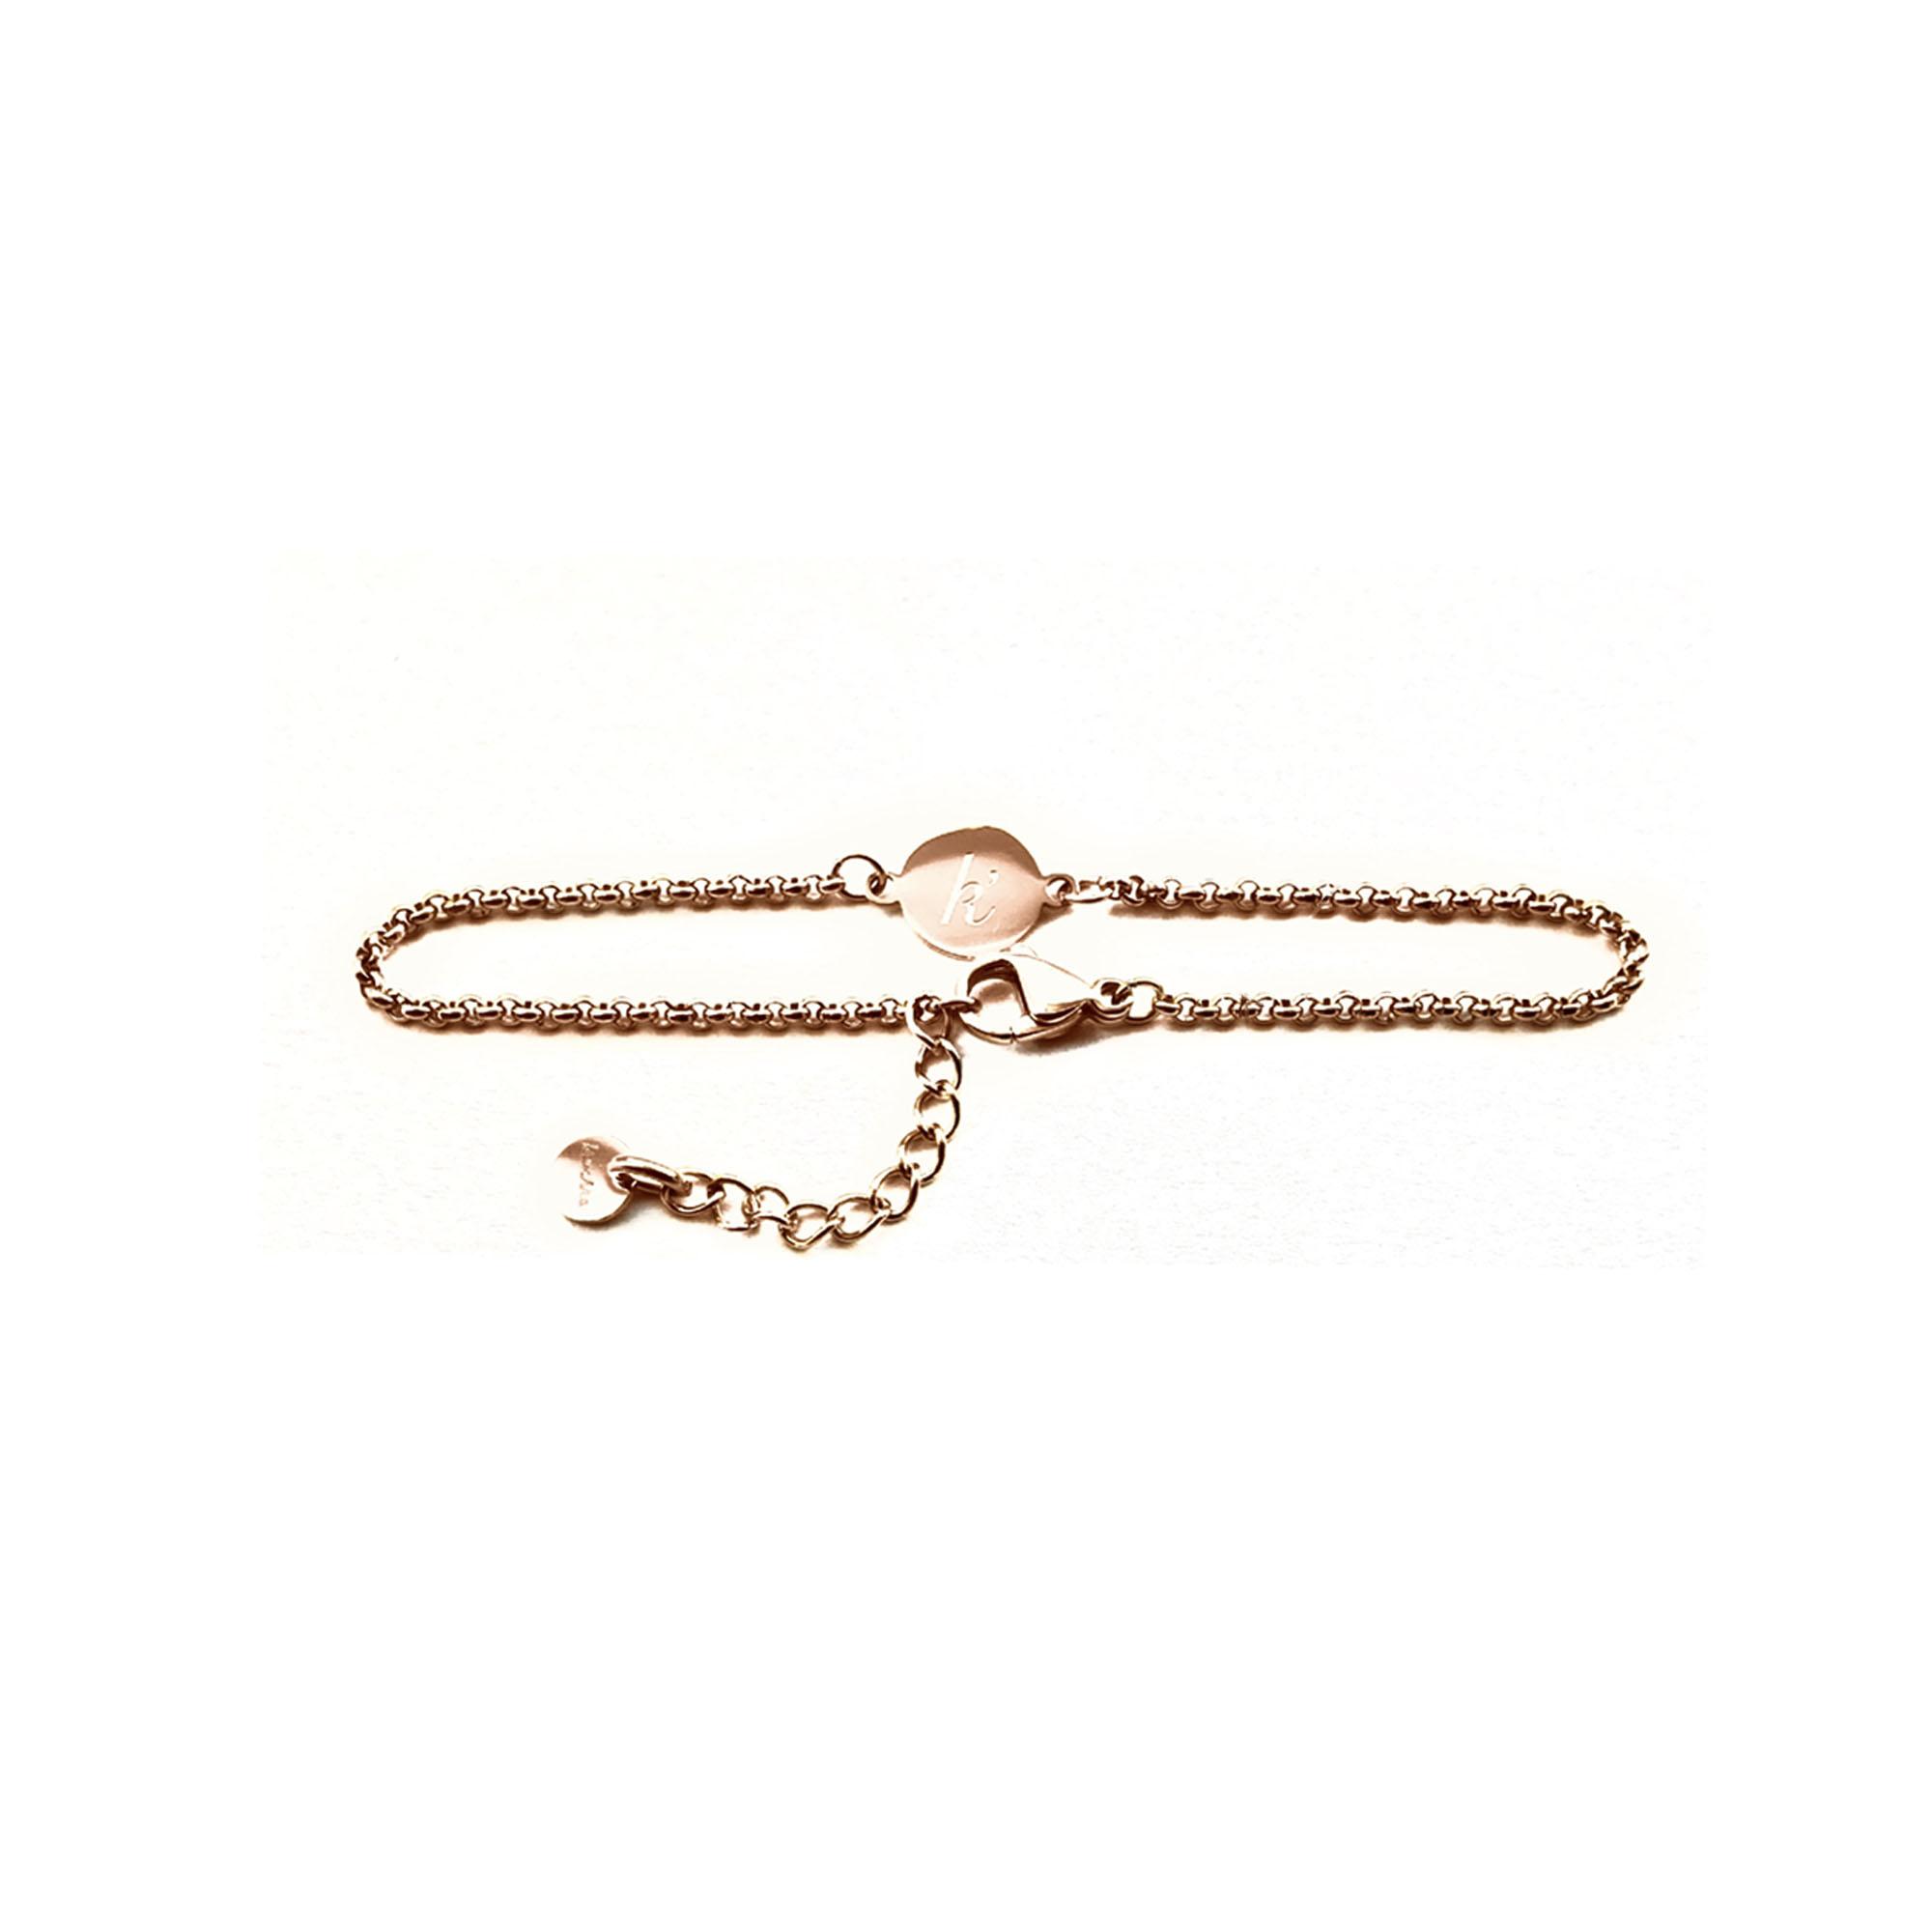 Verstelbaar rose plated RVS STEEL armbandje met plat bedeltje